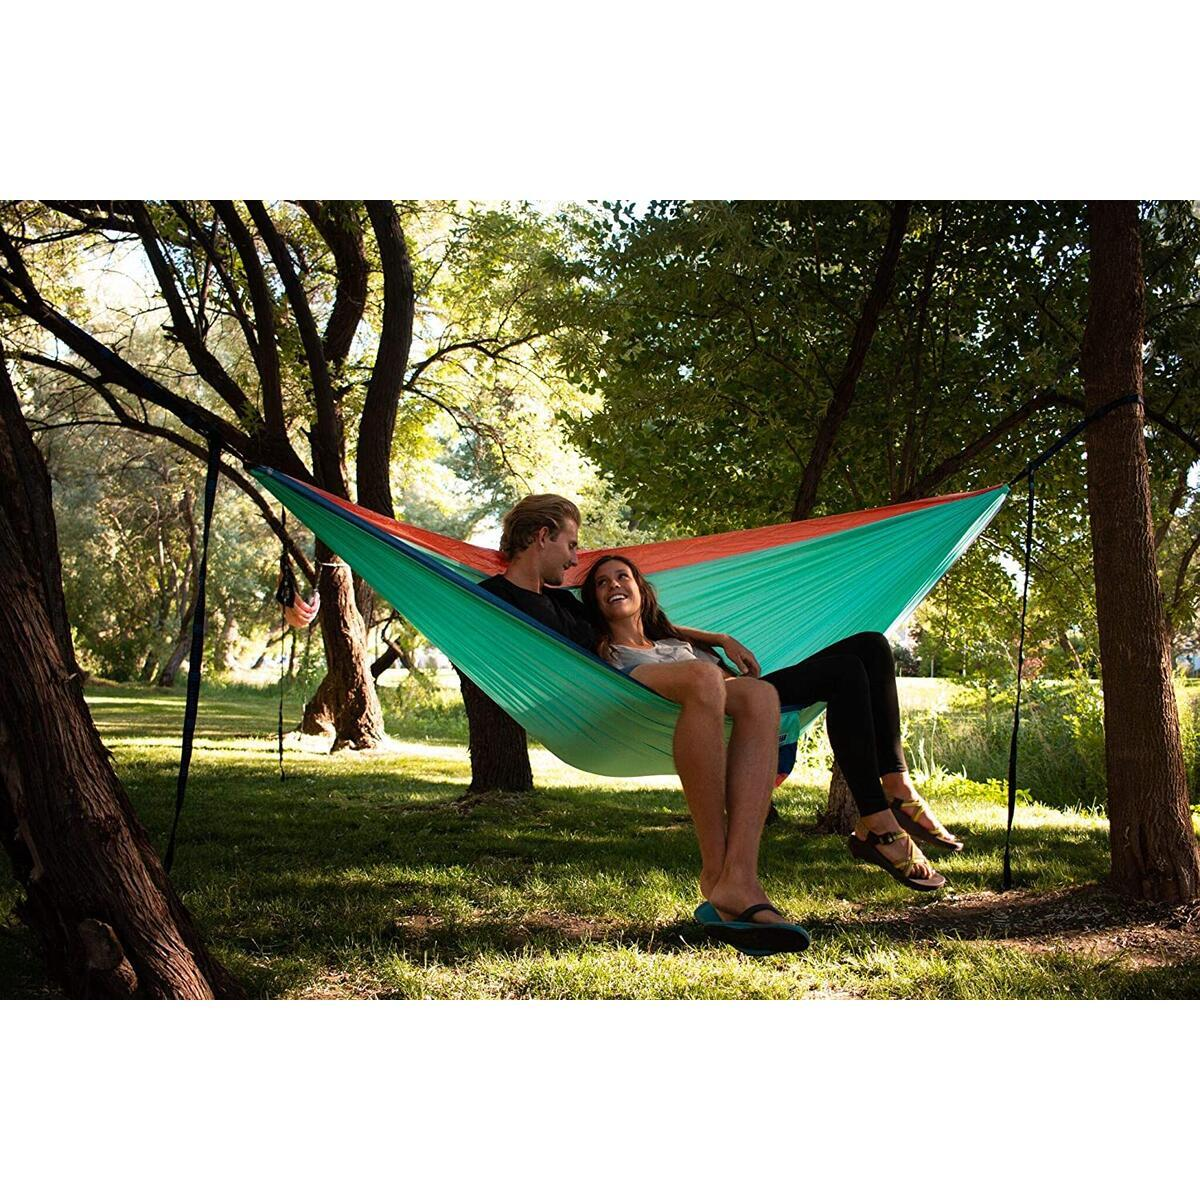 Camping Hammock - Any Color Variation